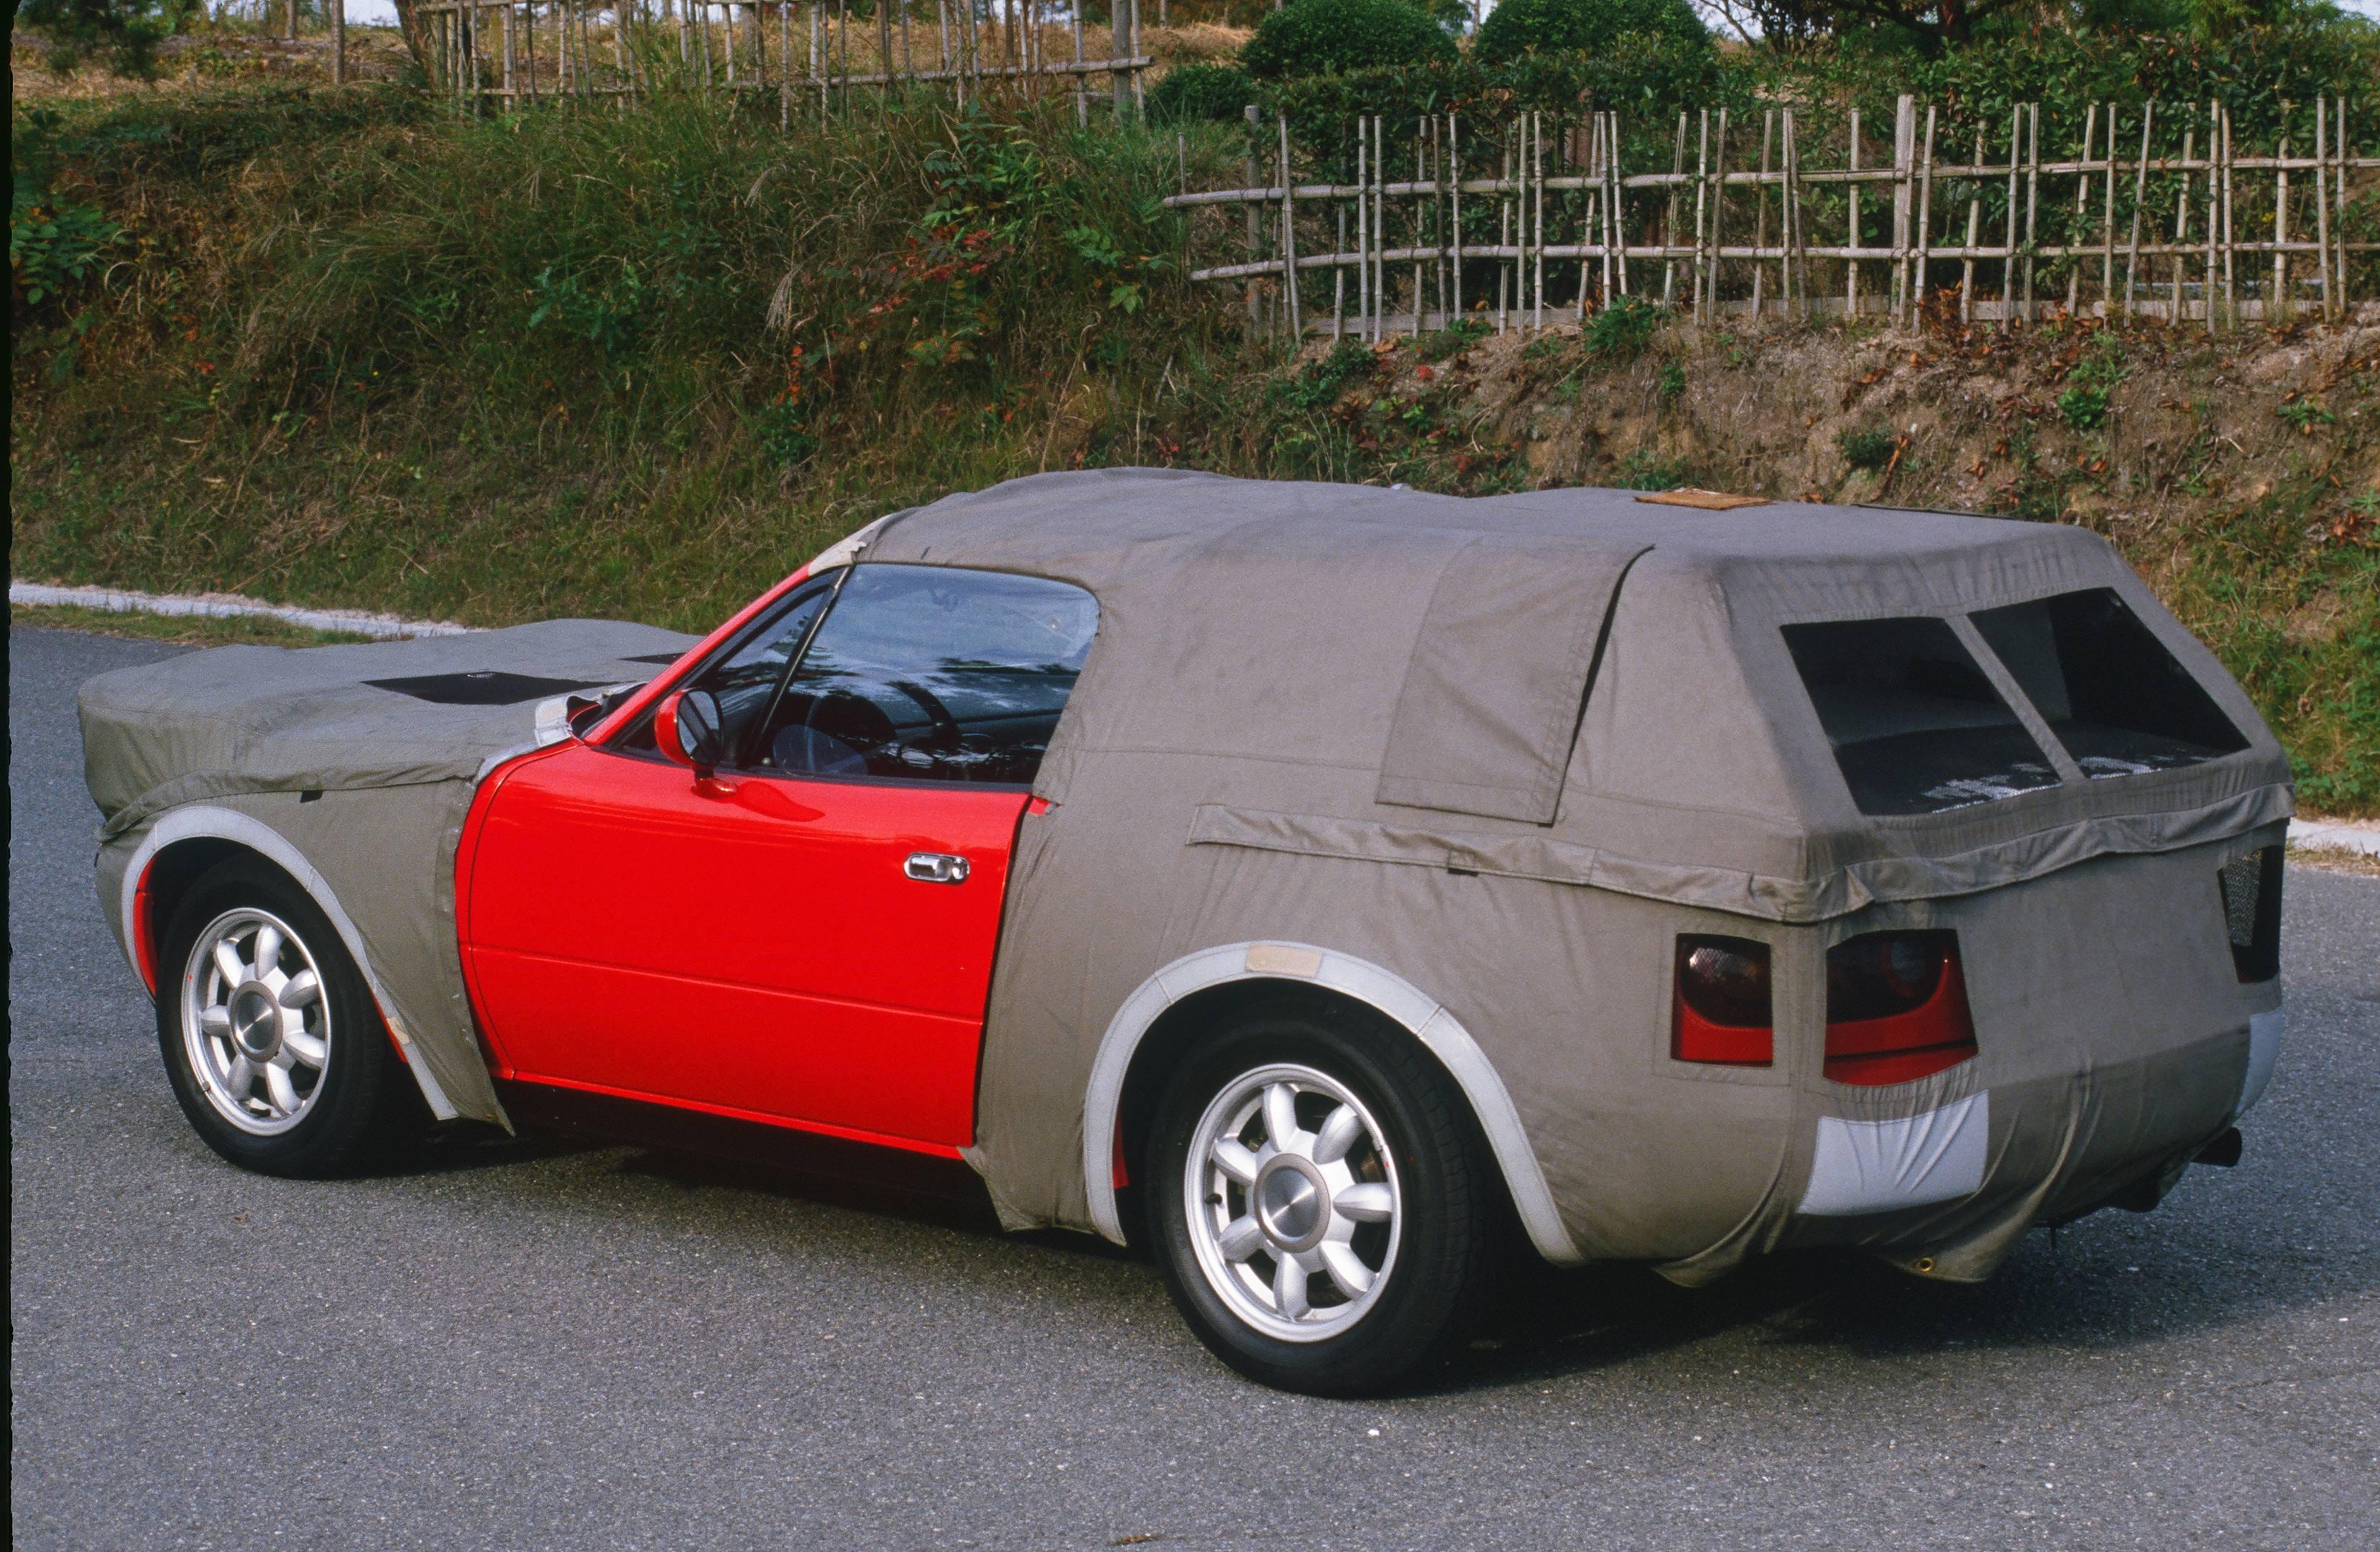 1990 mazda mx5 miata red test mule camoflage